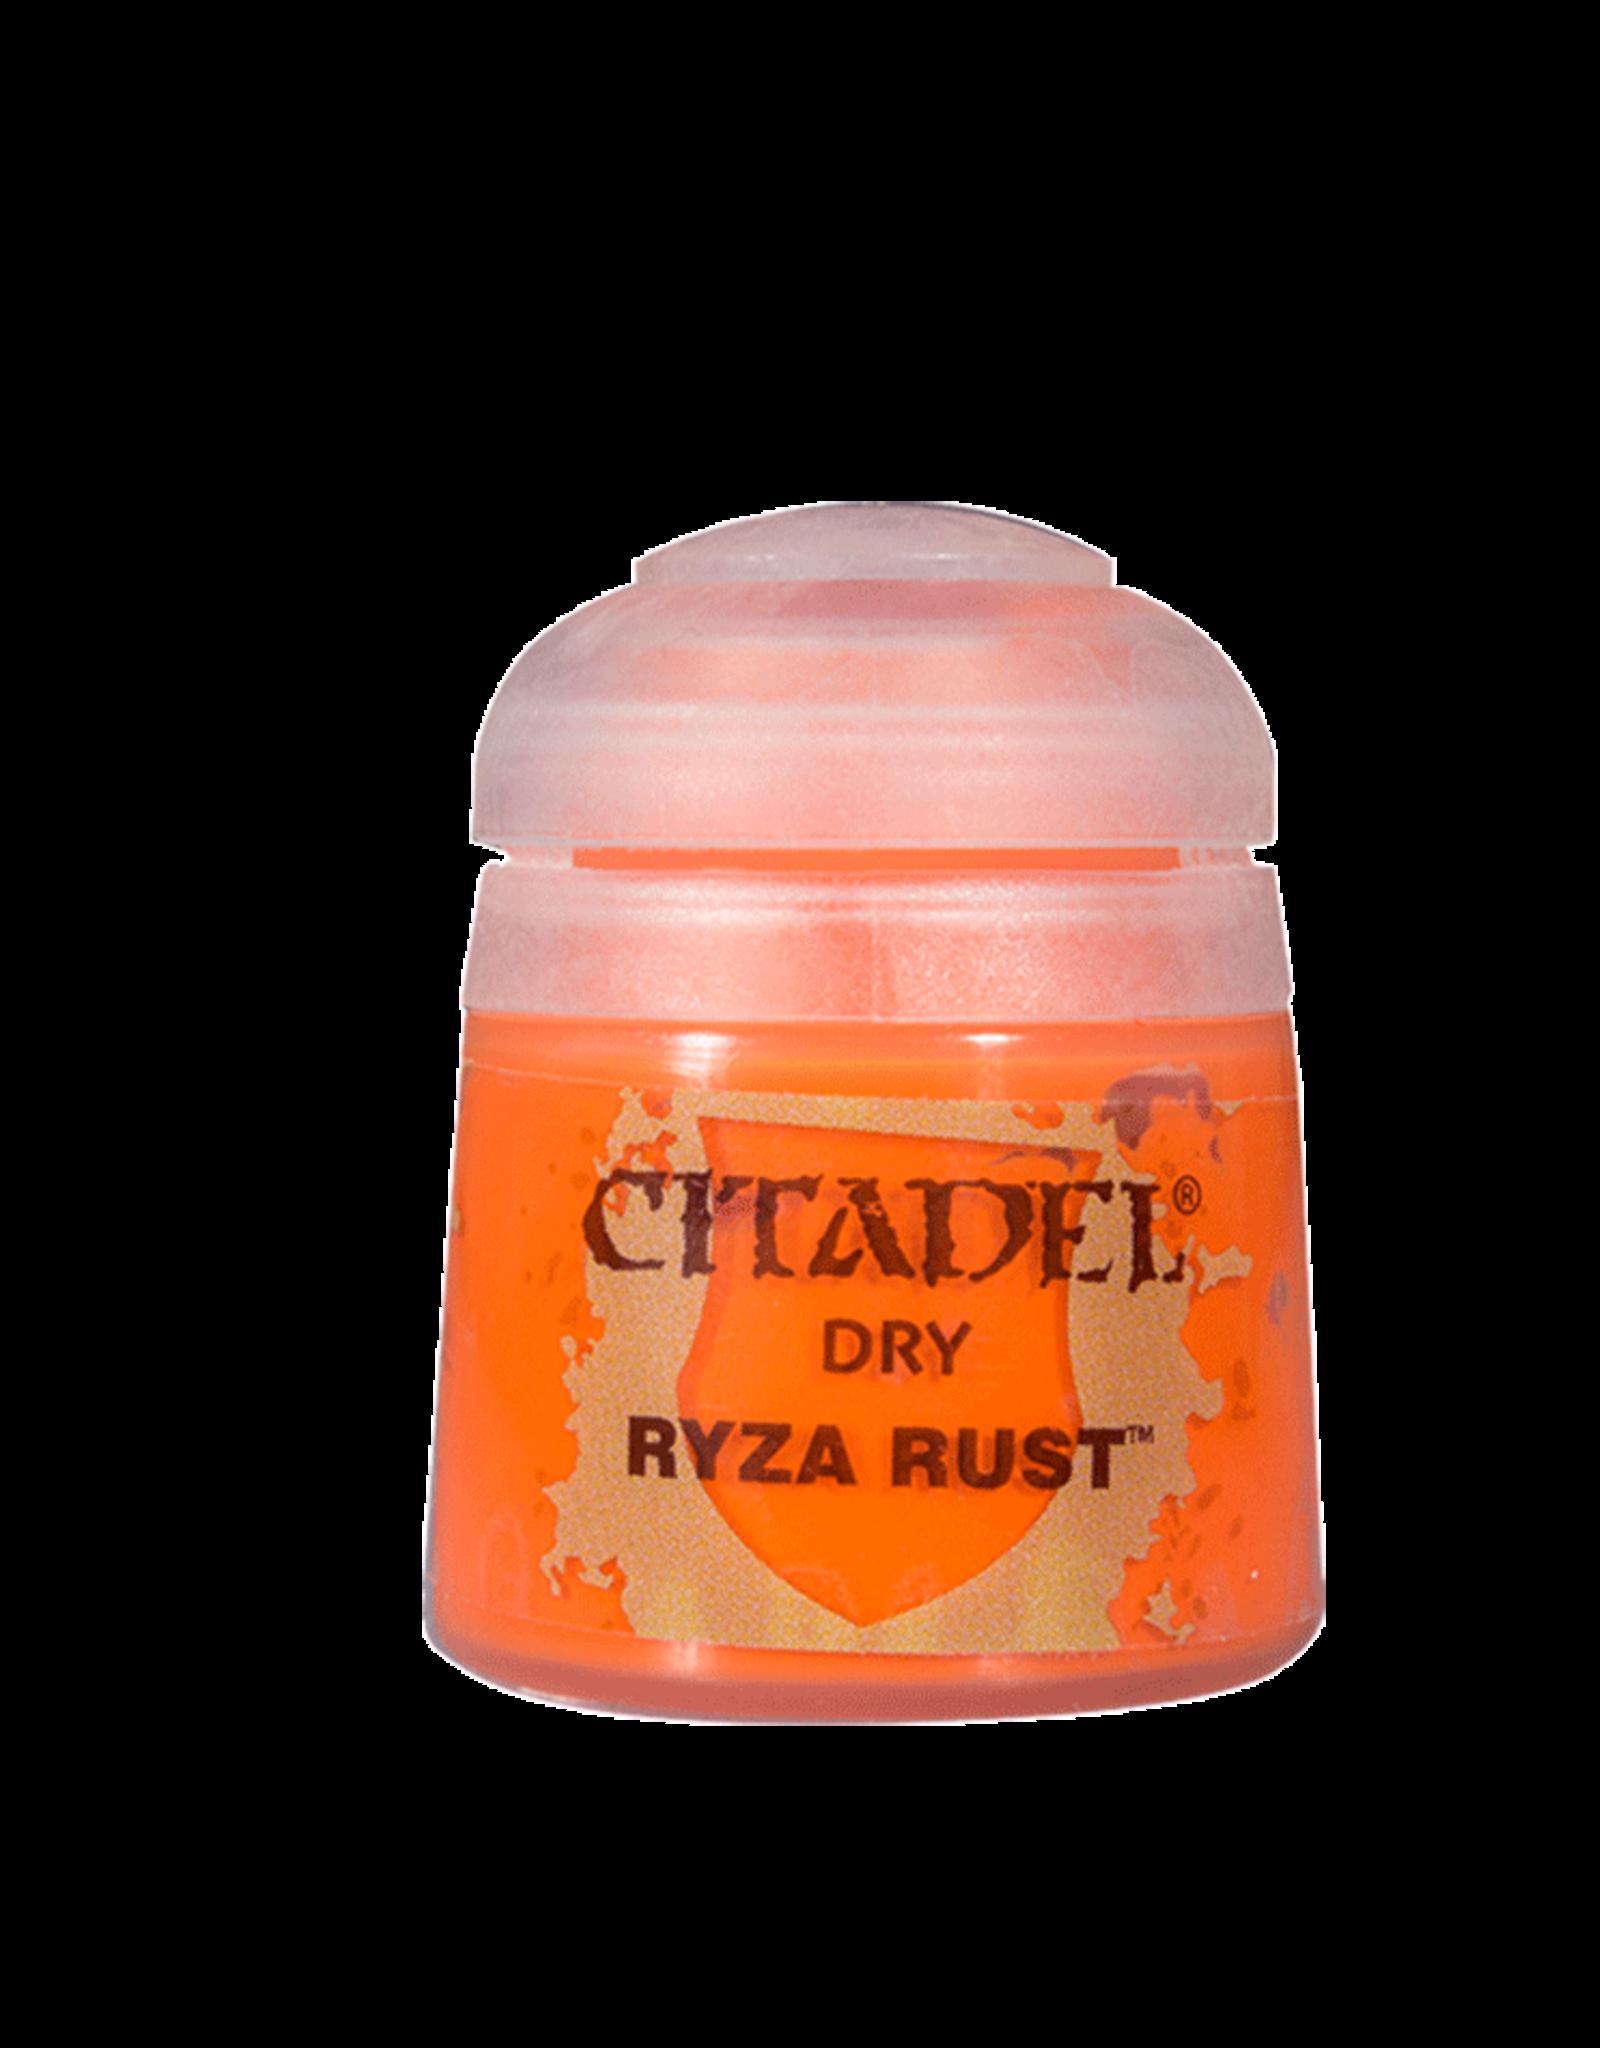 Games Workshop Citadel Dry: Ryza Rust